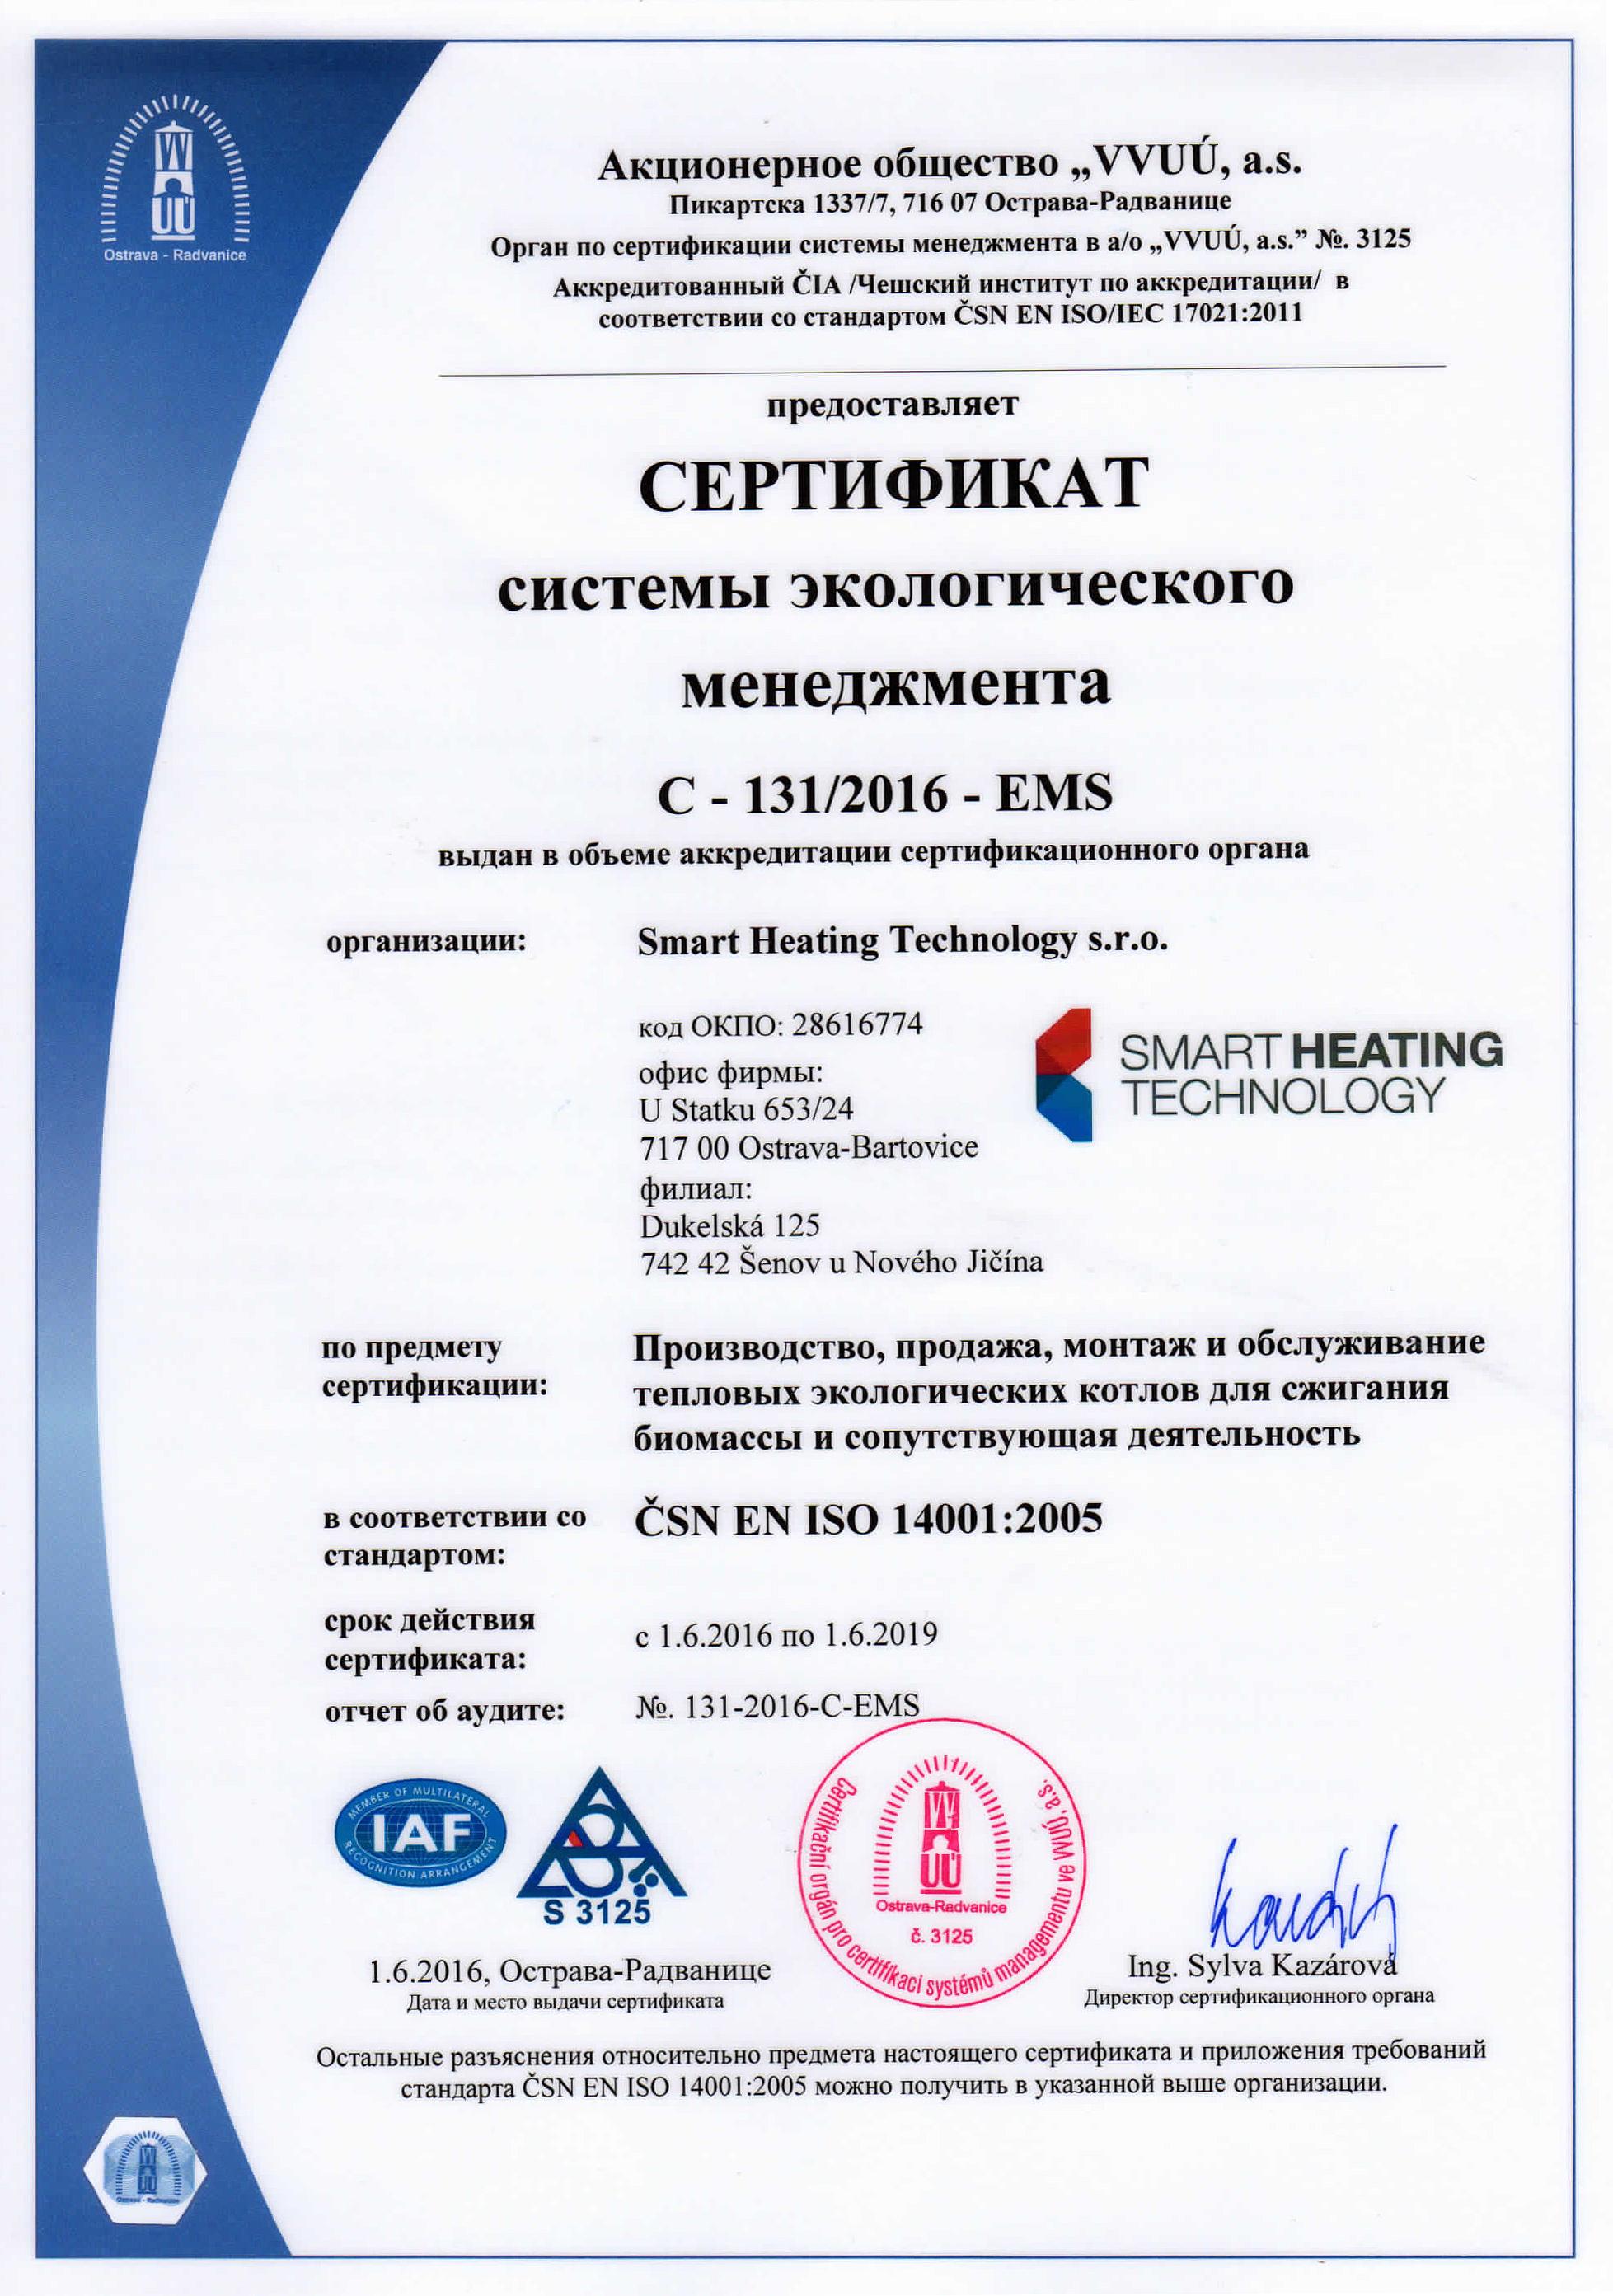 certifikat-c-131_2016-ems-ru